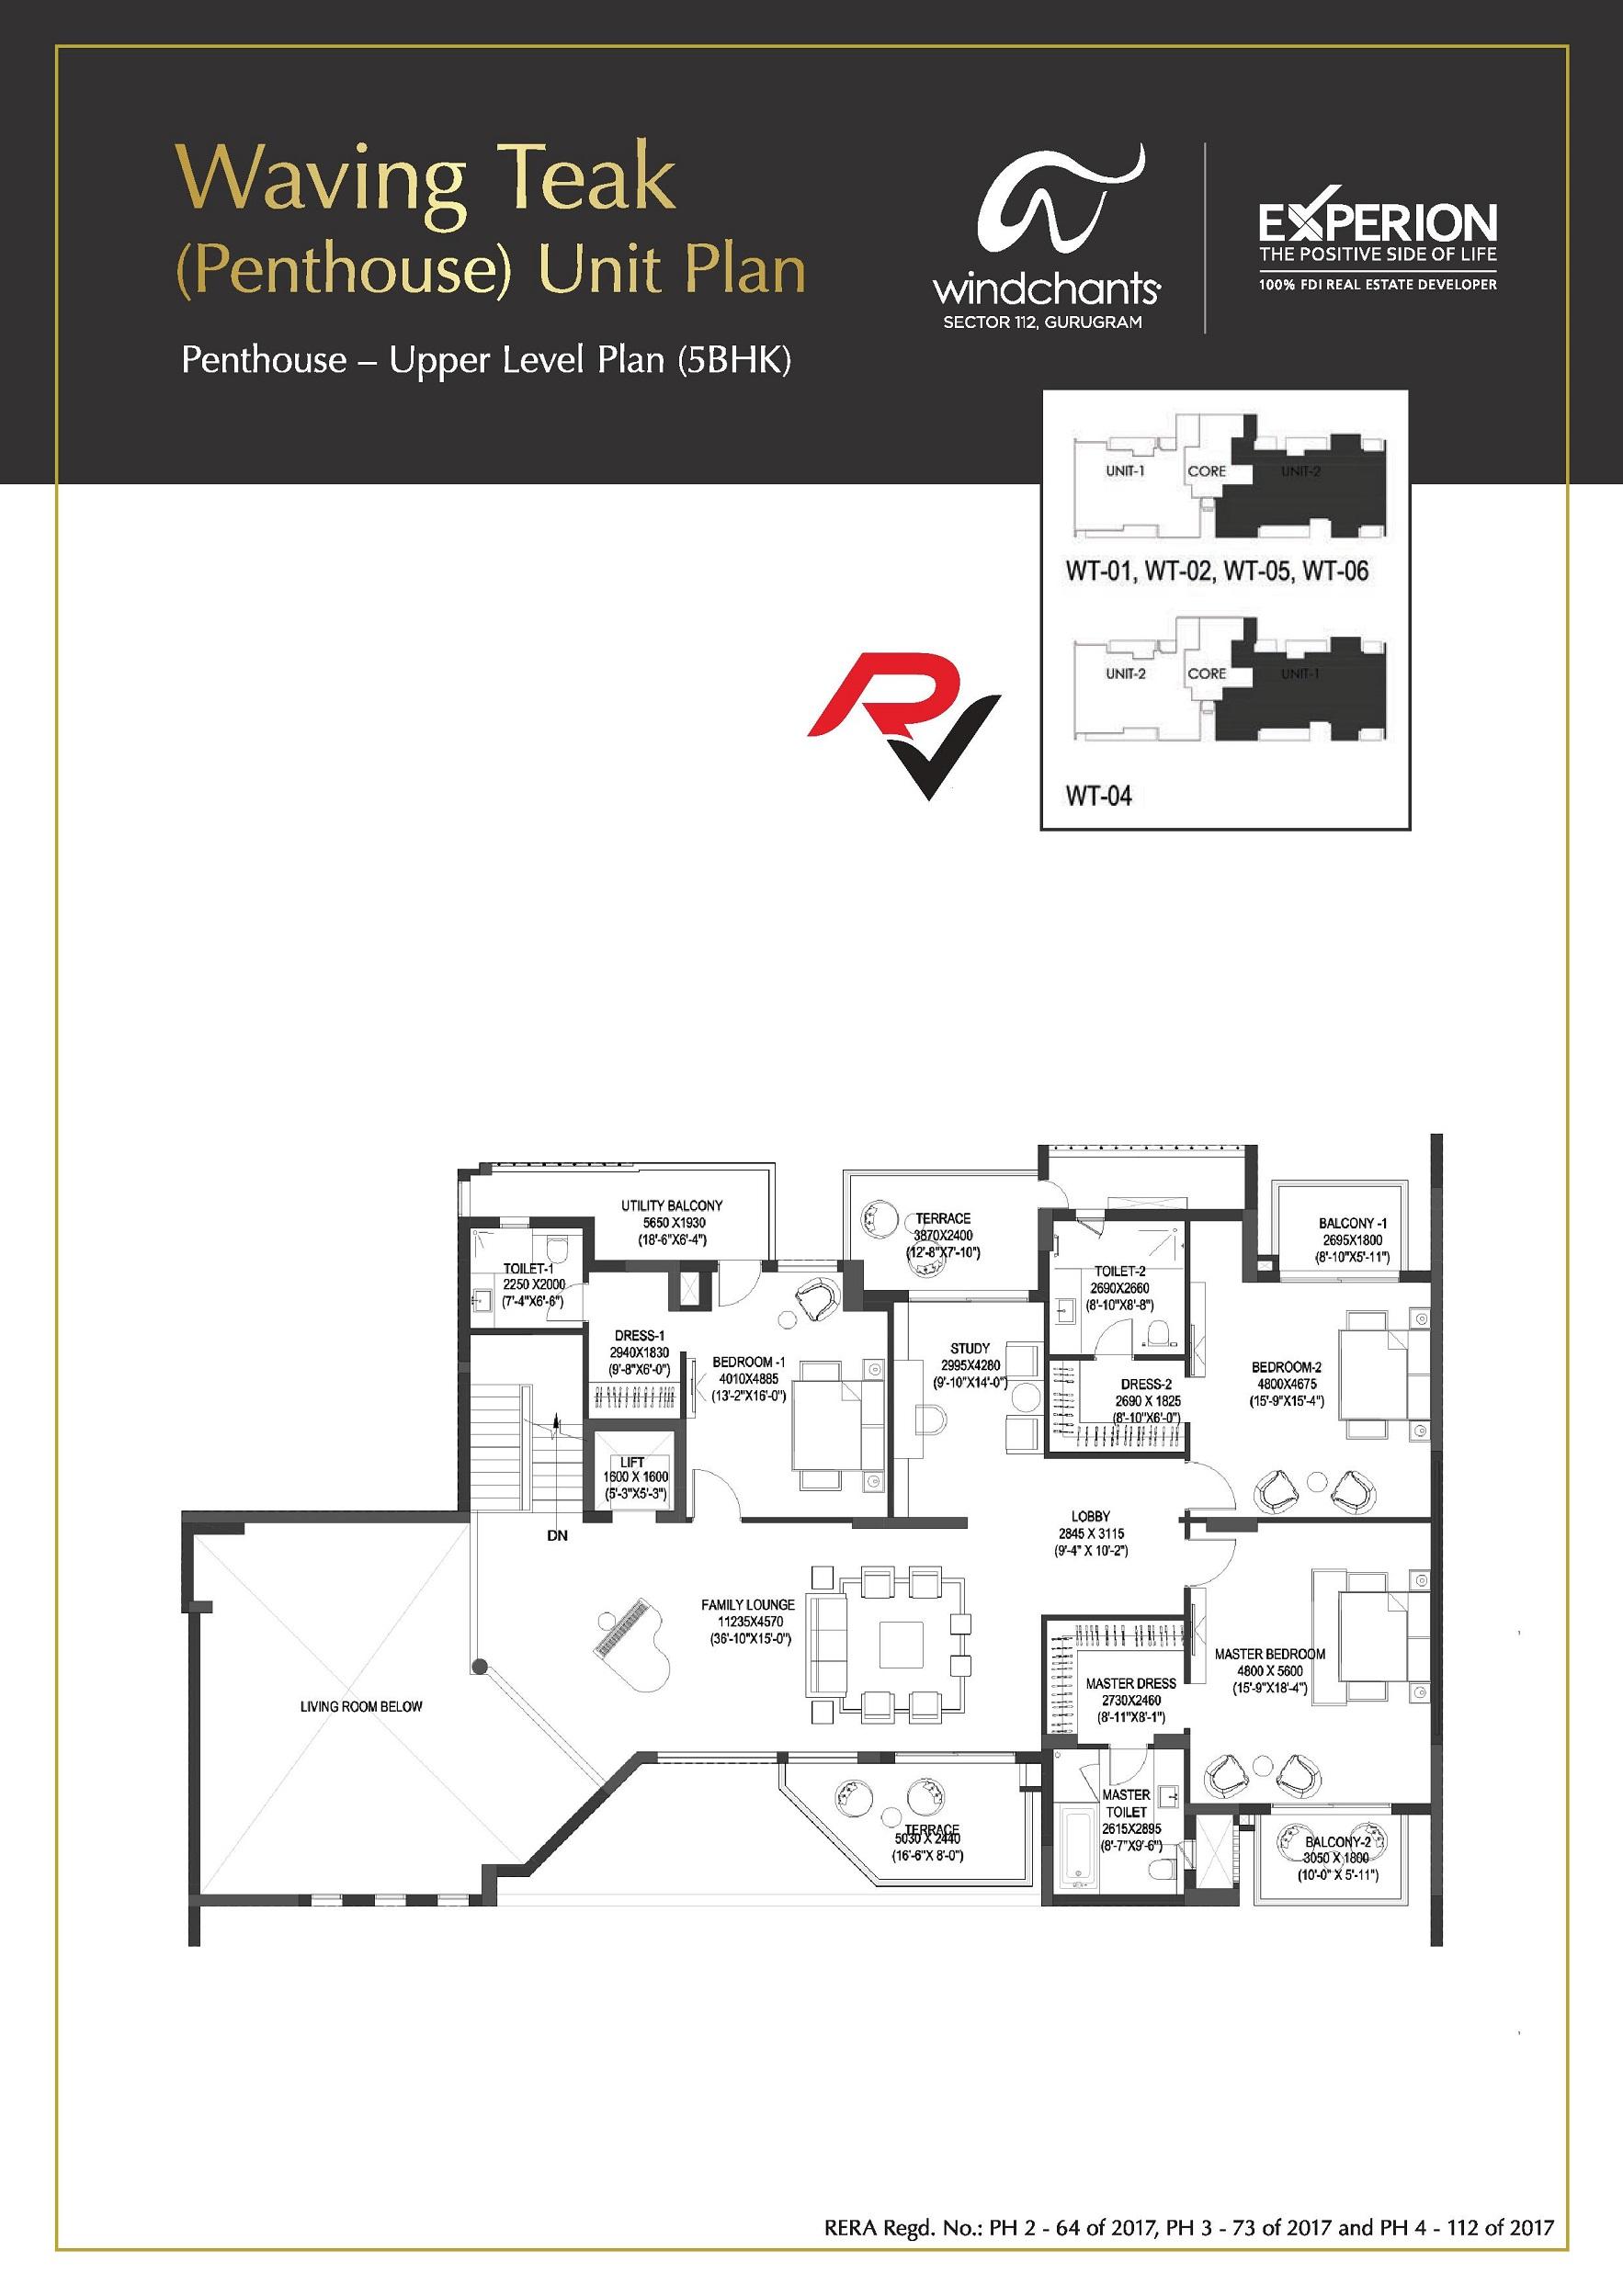 5Bhk Penthouse (Upper Level Plan)